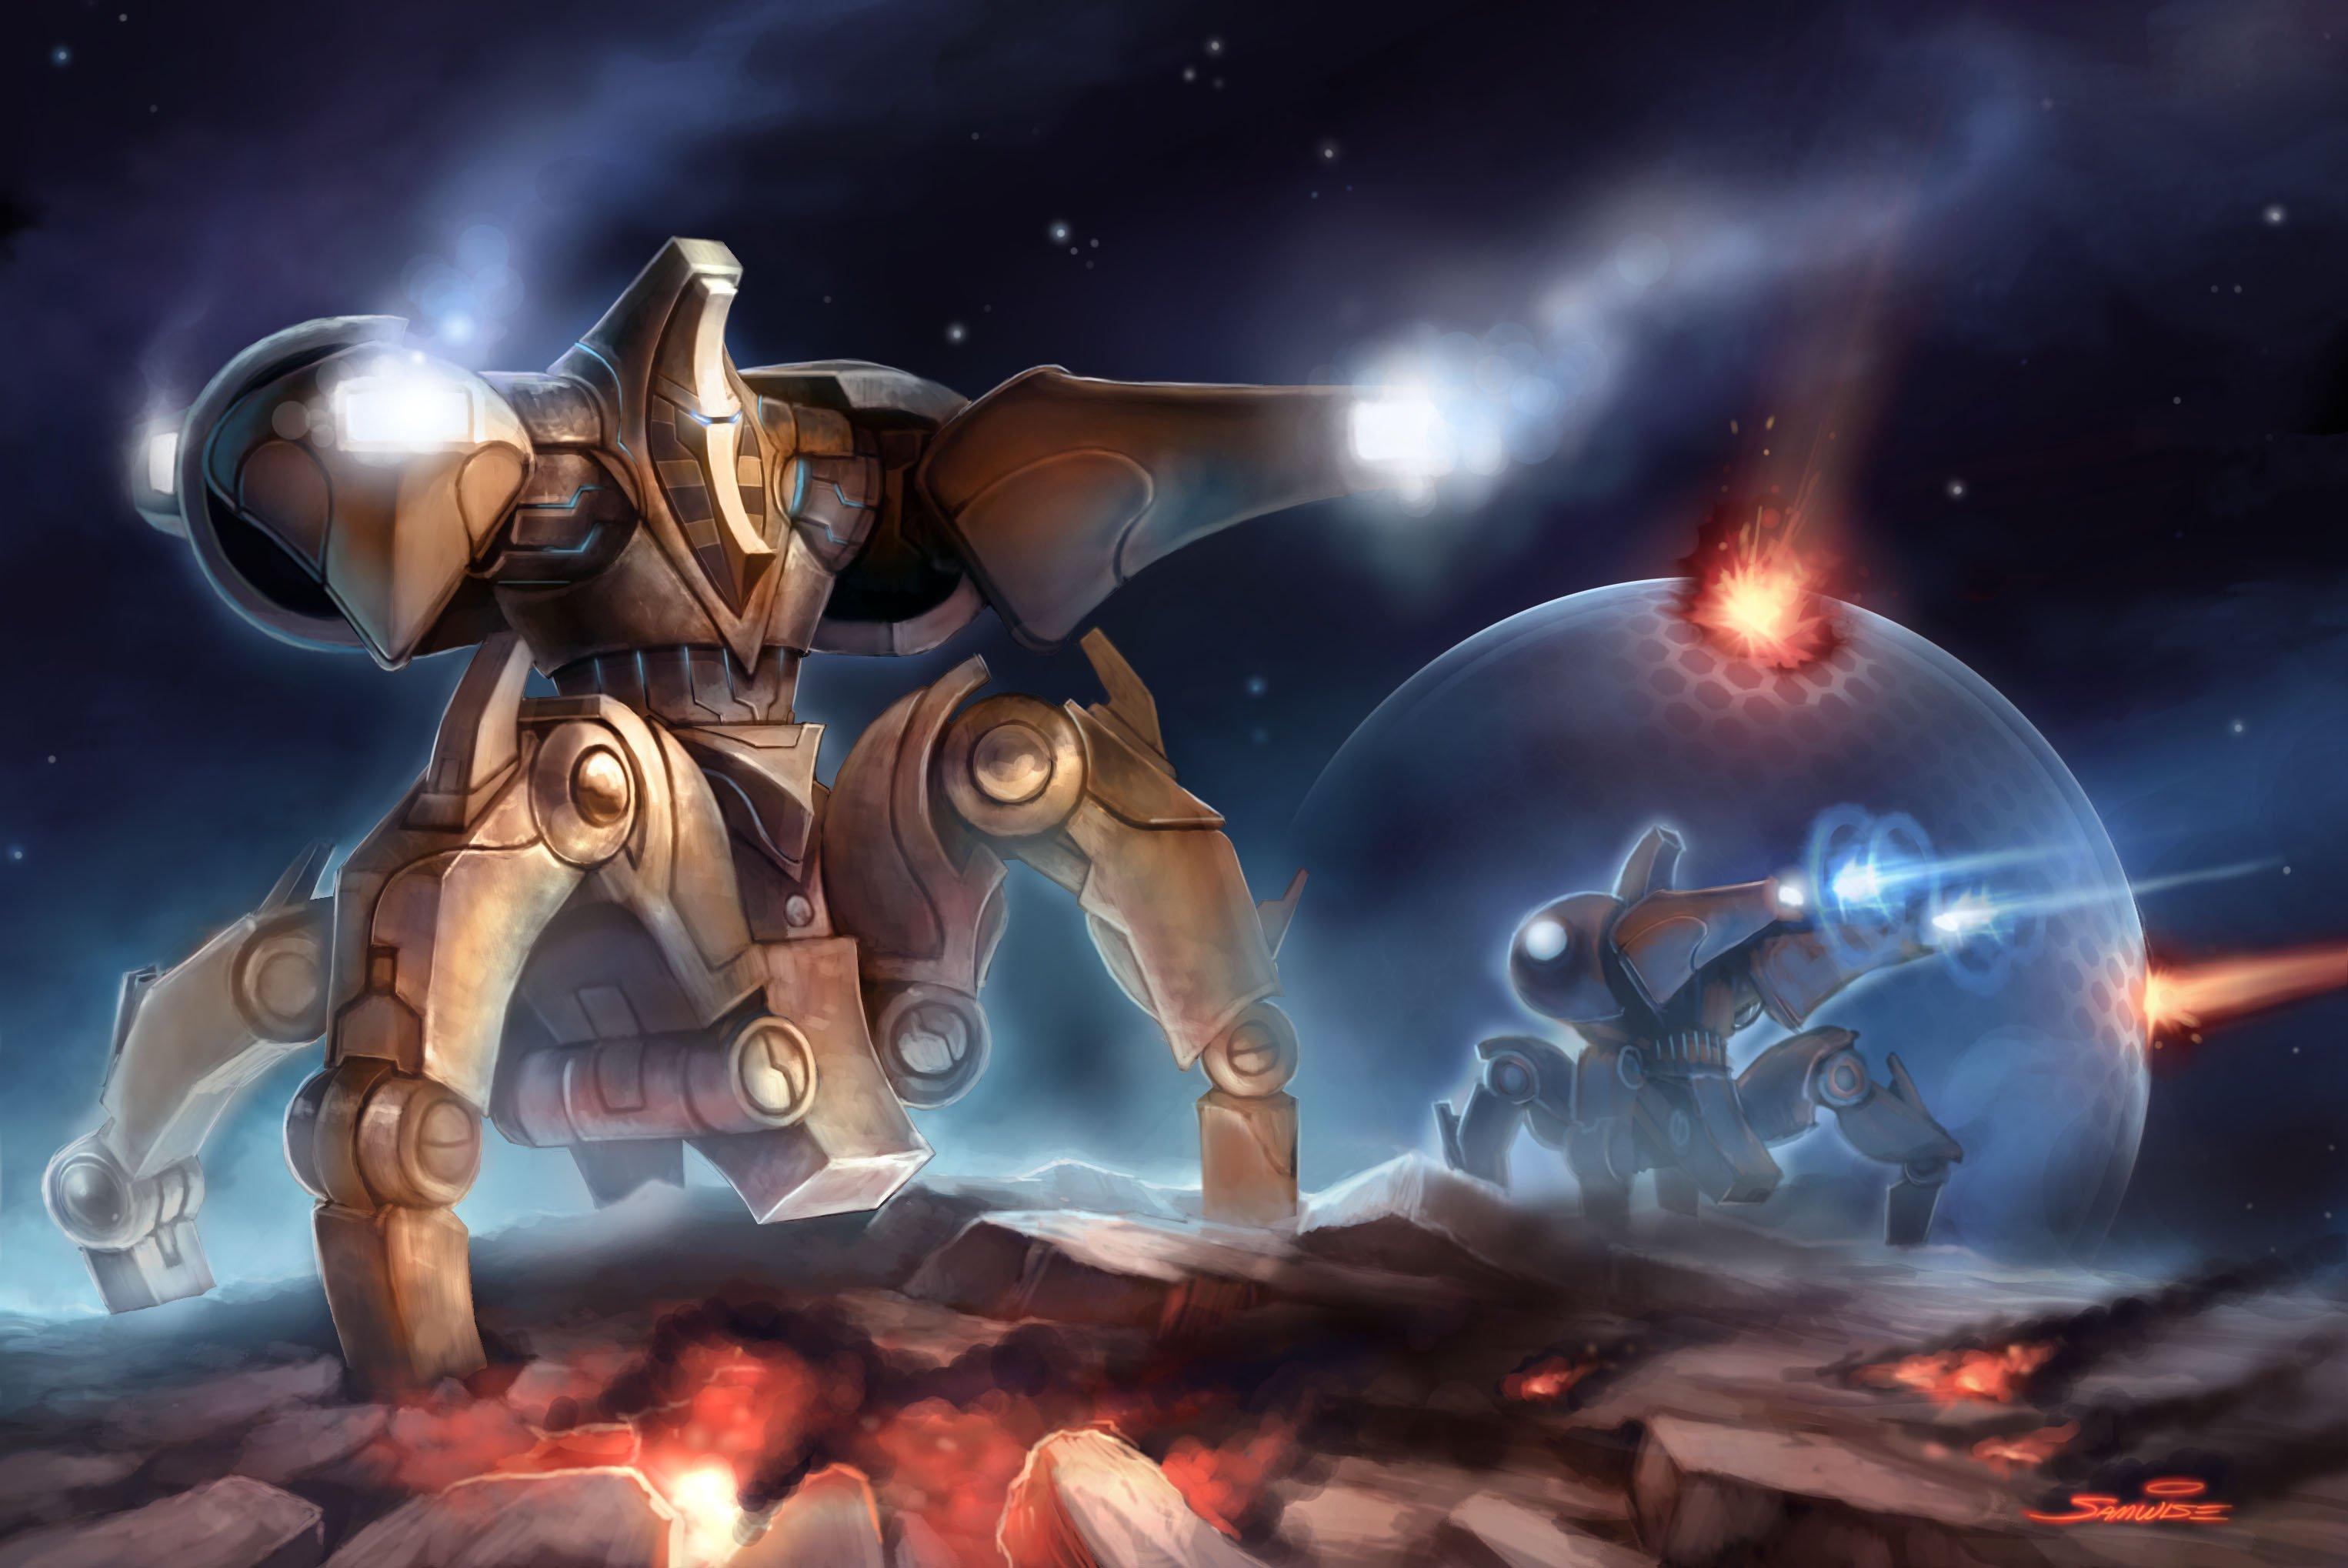 Immortal starcraft wiki fandom powered by wikia - Starcraft 2 wallpaper art ...